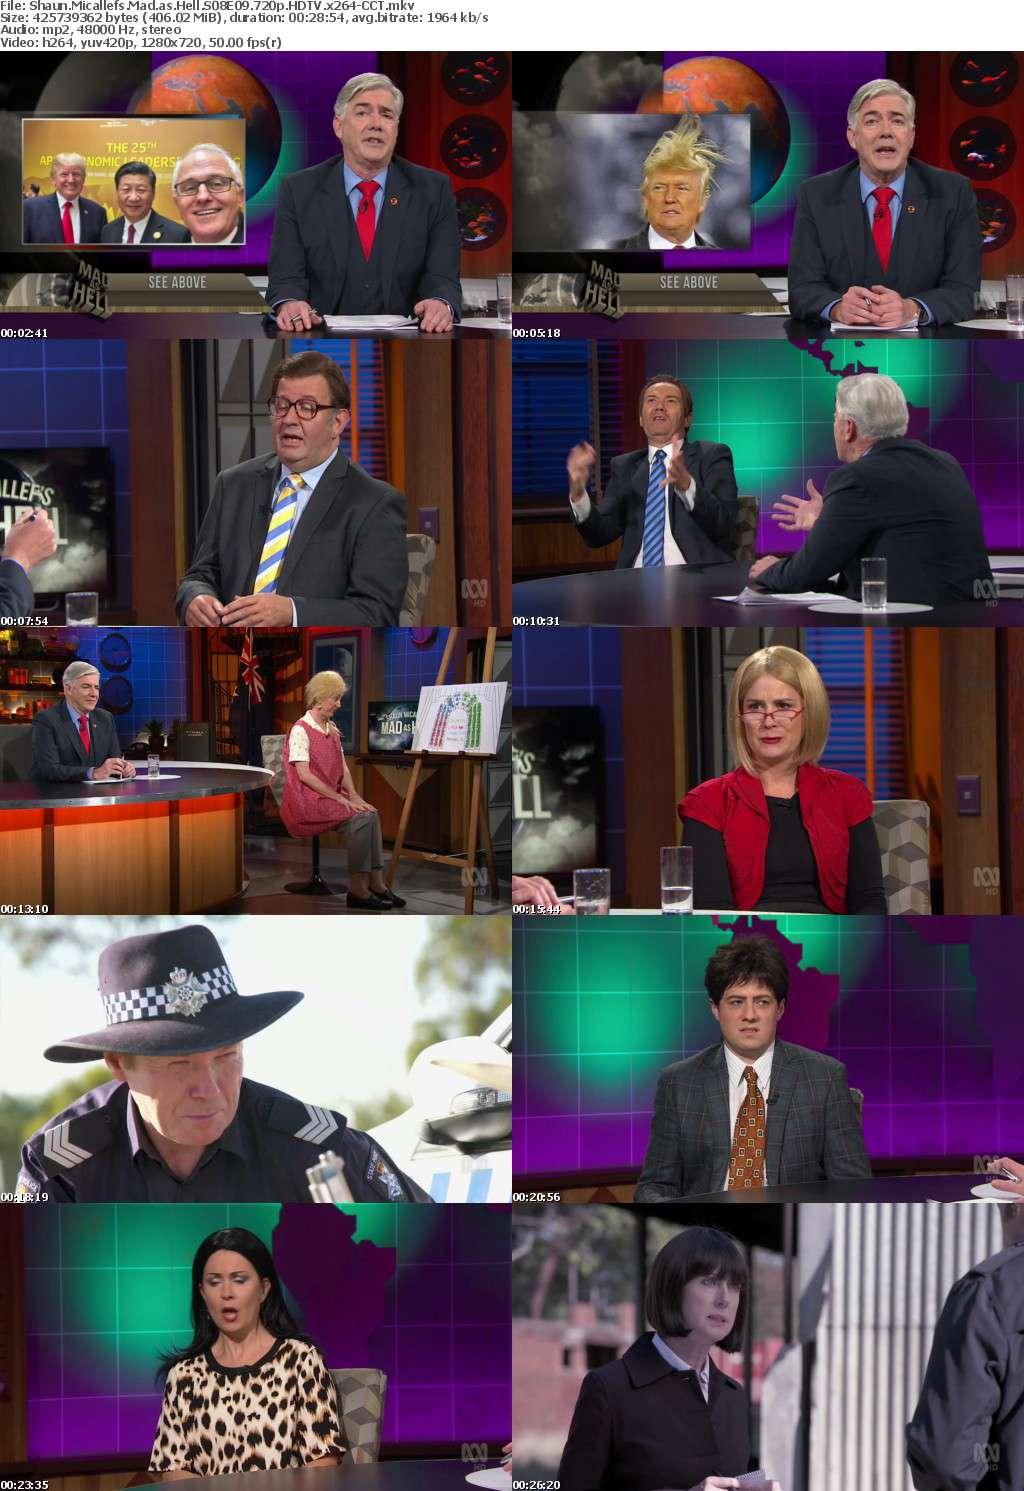 Shaun Micallefs Mad as Hell S08E09 720p HDTV x264-CCT